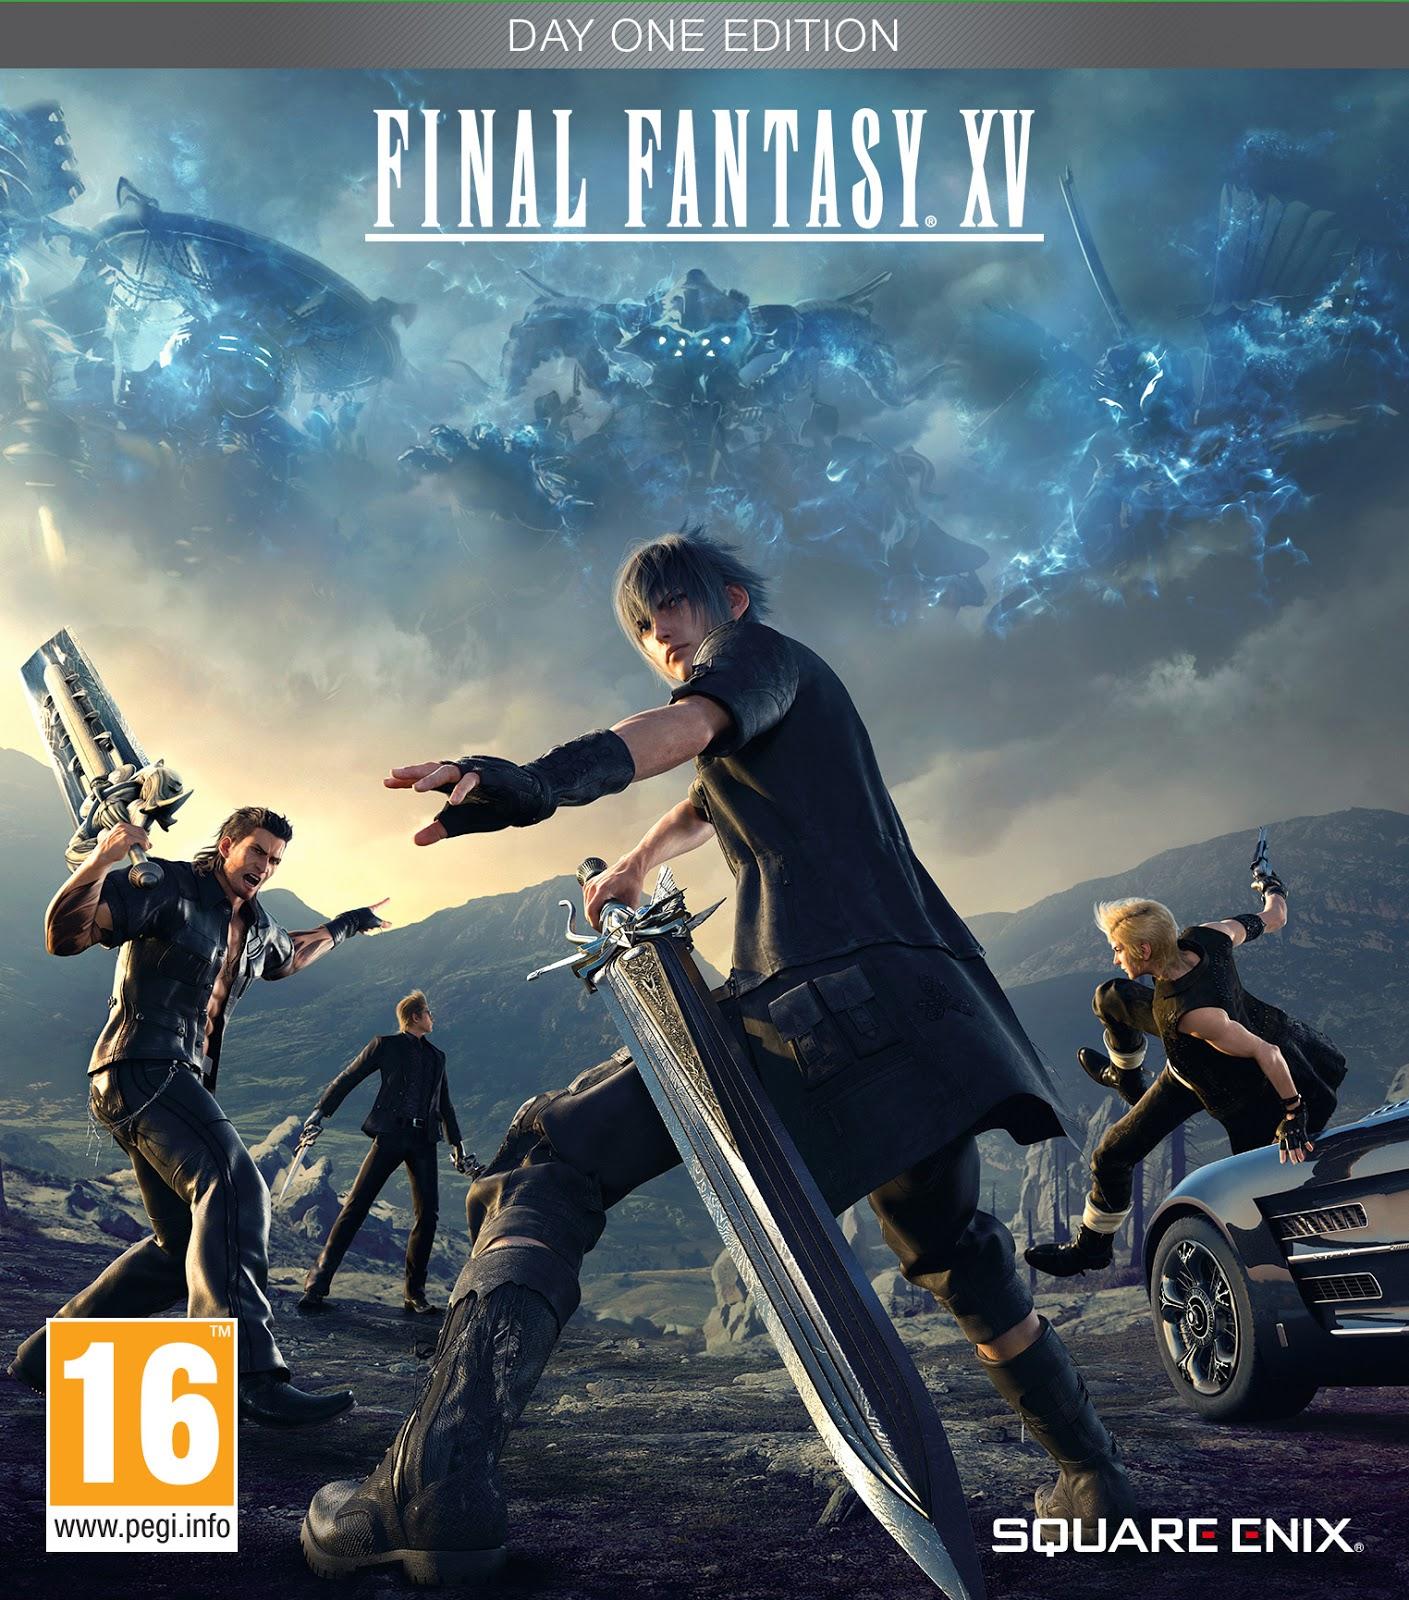 Final fantasy xv pocket edition hd | nintendo switch download.